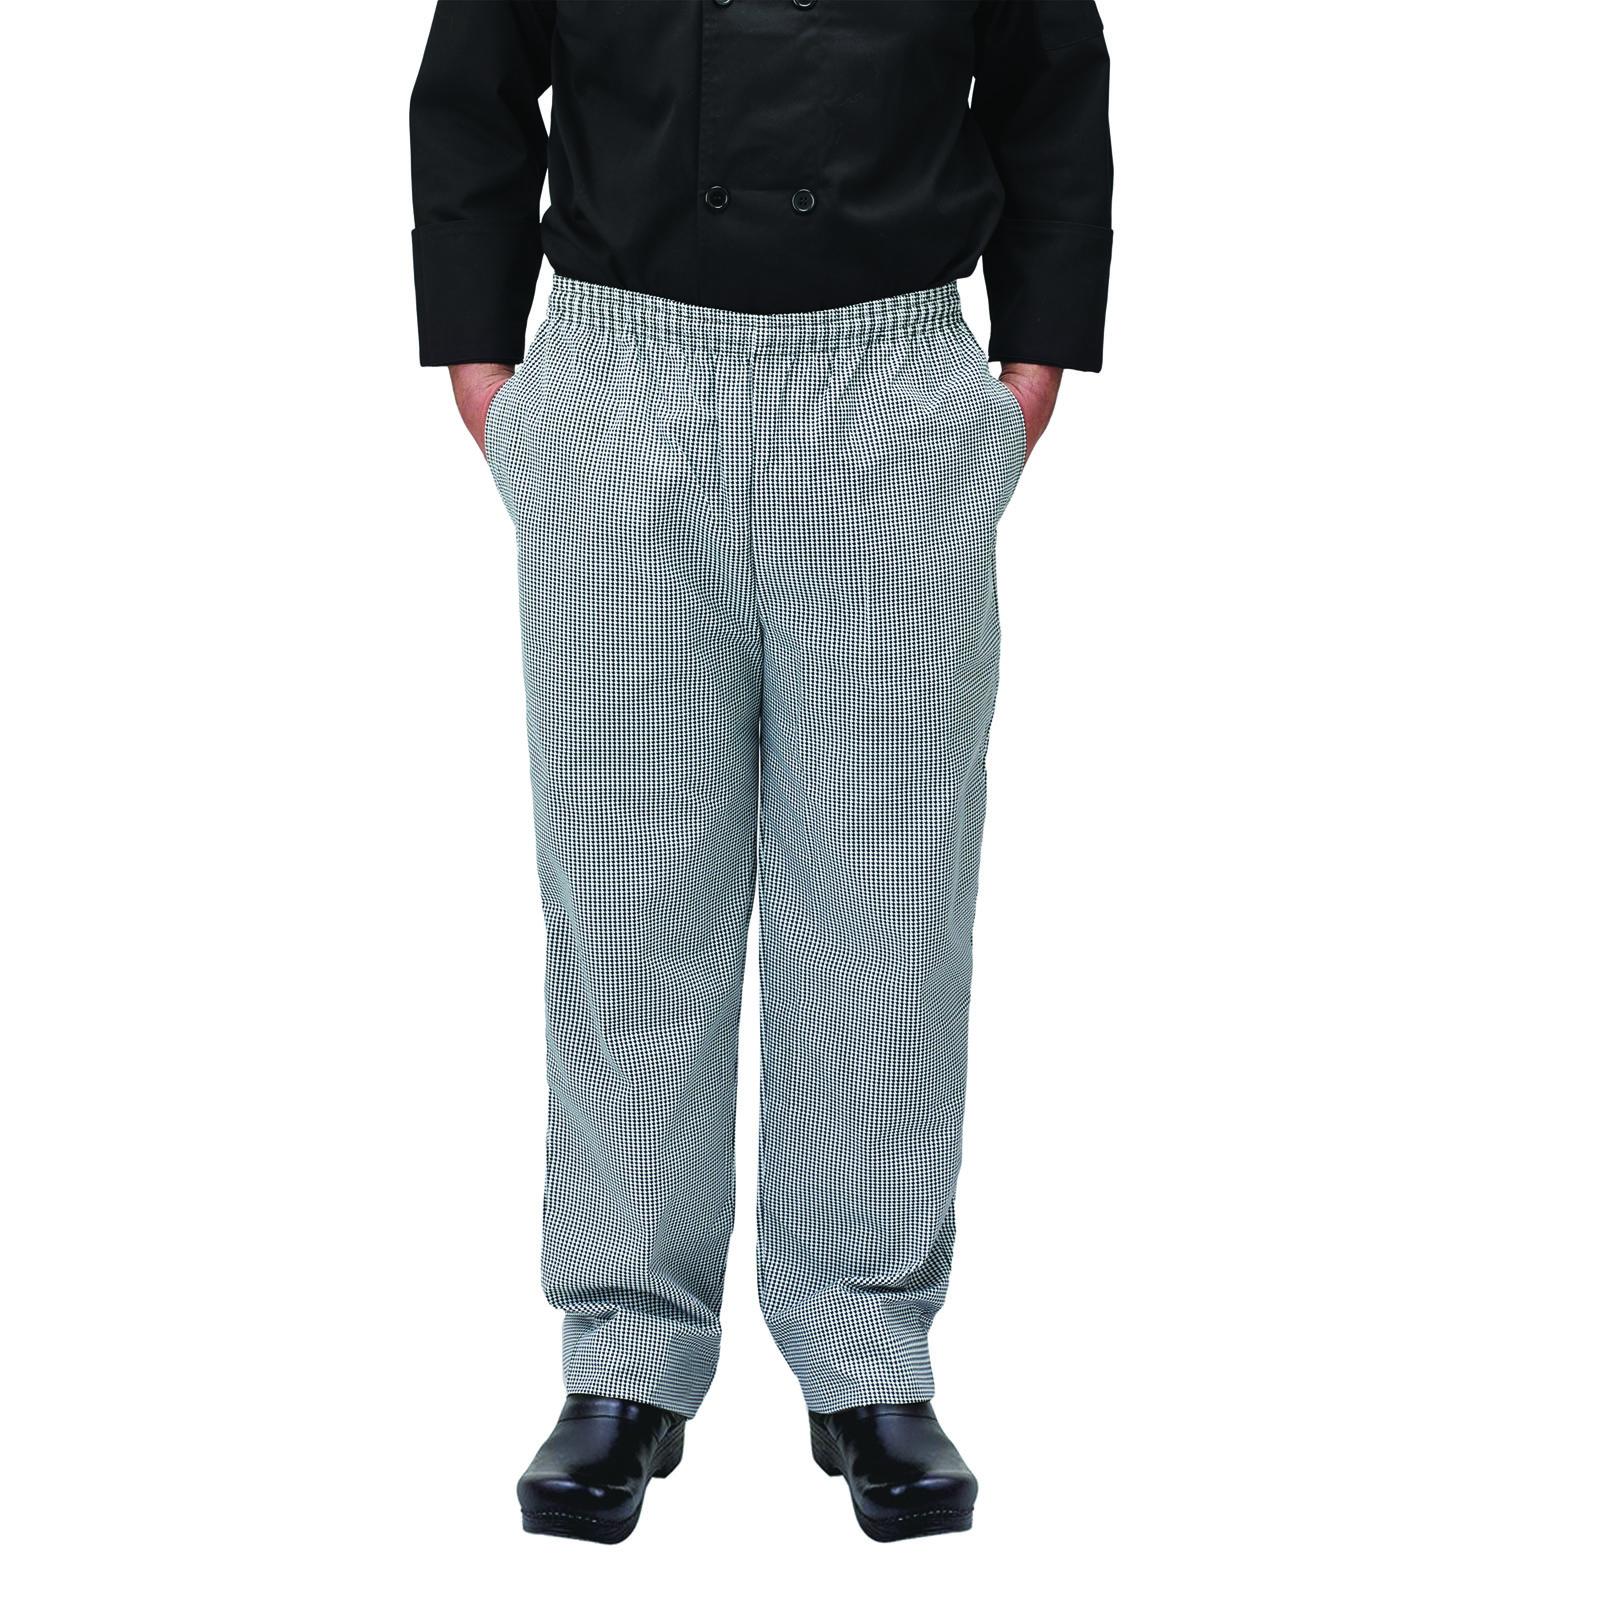 Winco UNF-4KS chef's pants